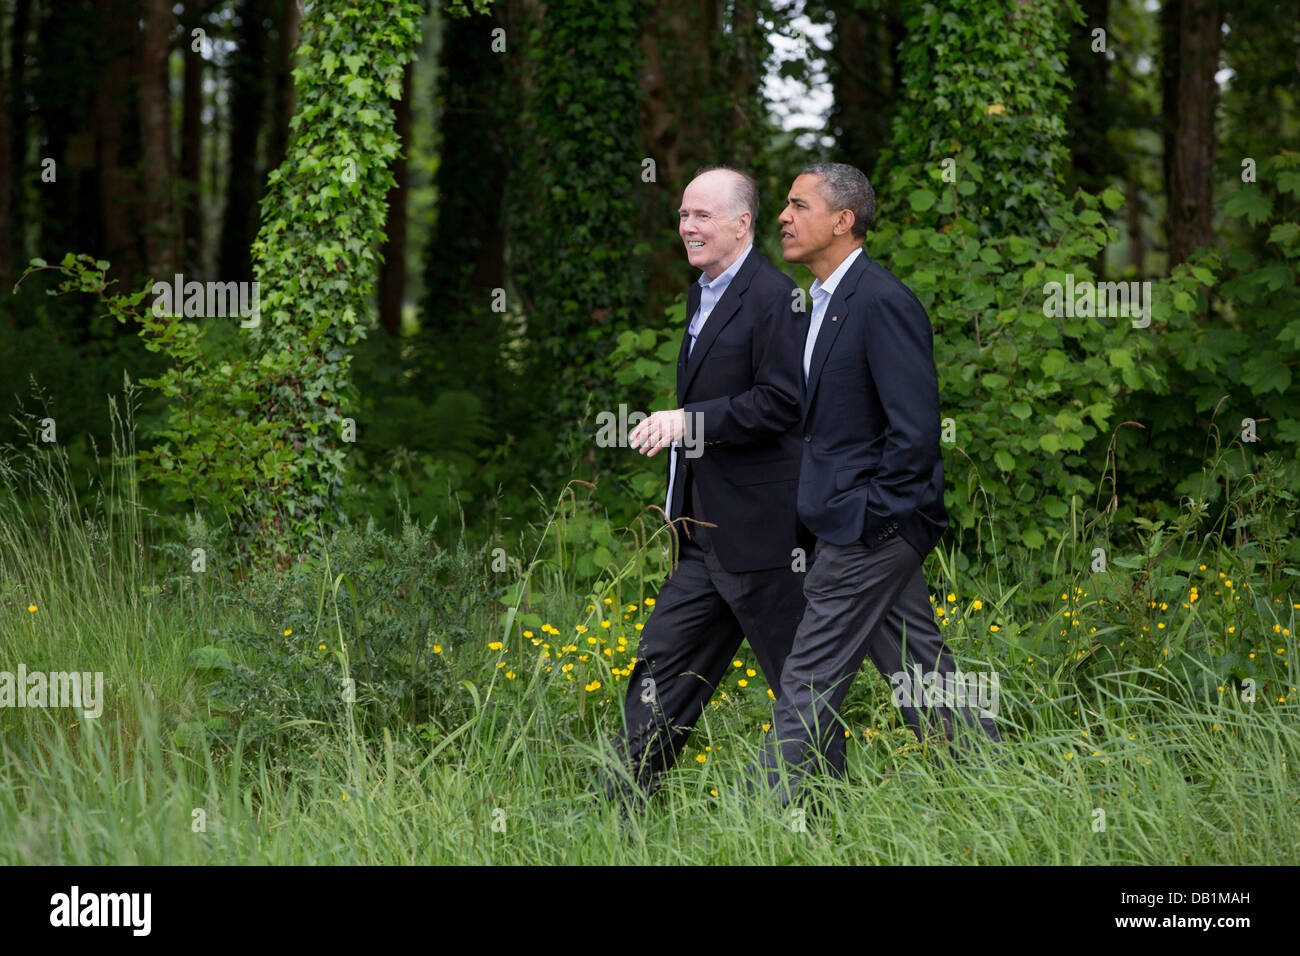 US President Barack Obama walks with National Security Advisor Tom Donilon on the grounds of Lough Erne Resort at - Stock Image